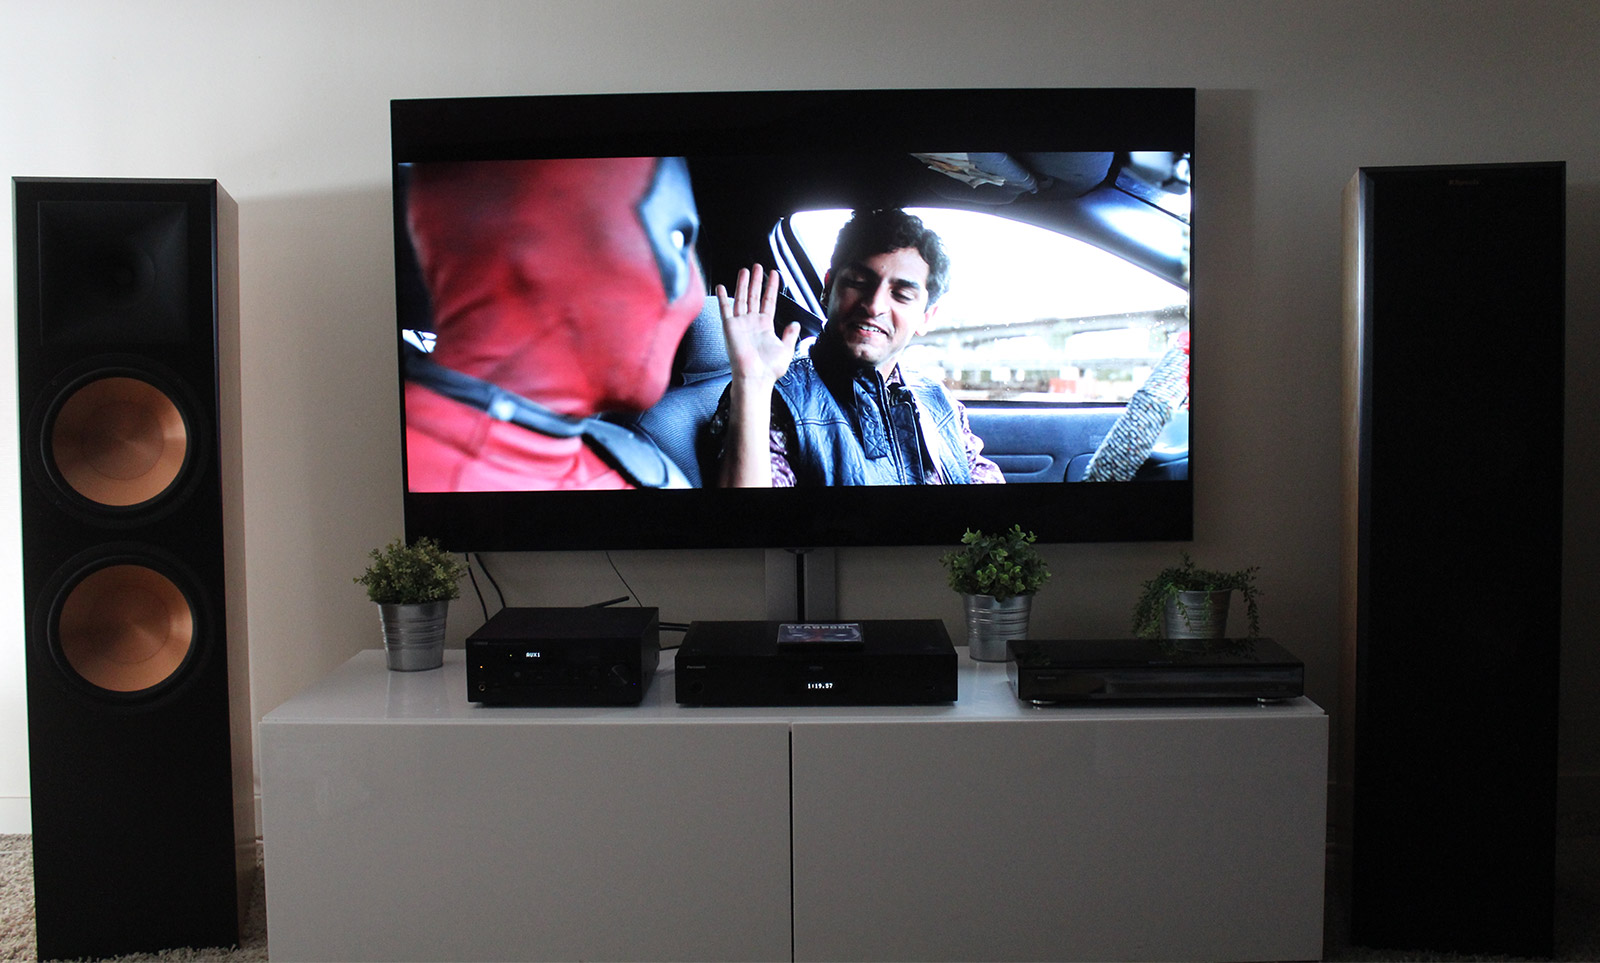 Review: Panasonic DP-UB9000: 4K HDR10+/Dolby Vision Blu-ray player